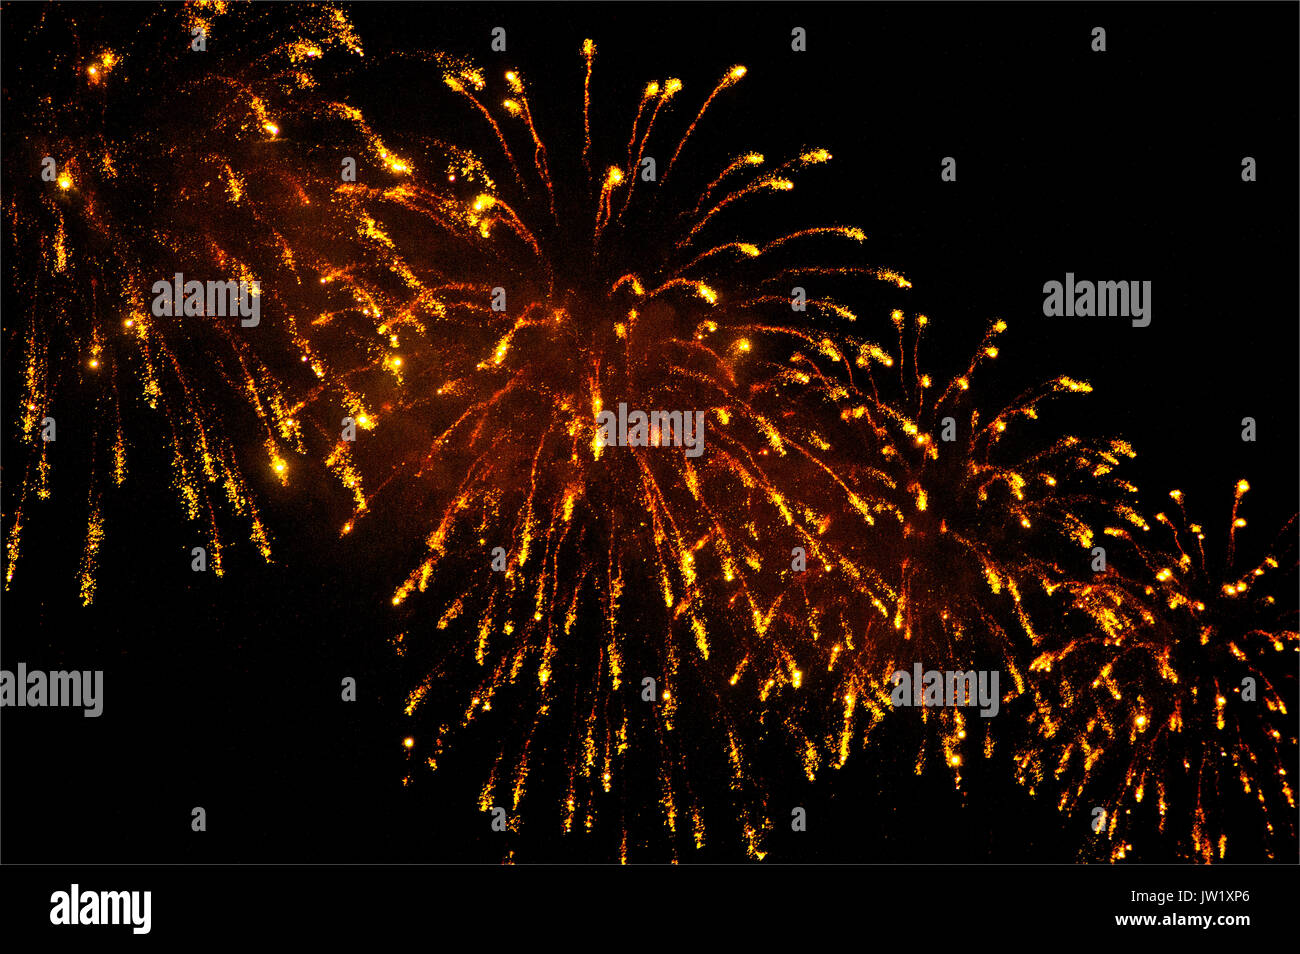 fireworks display - Stock Image